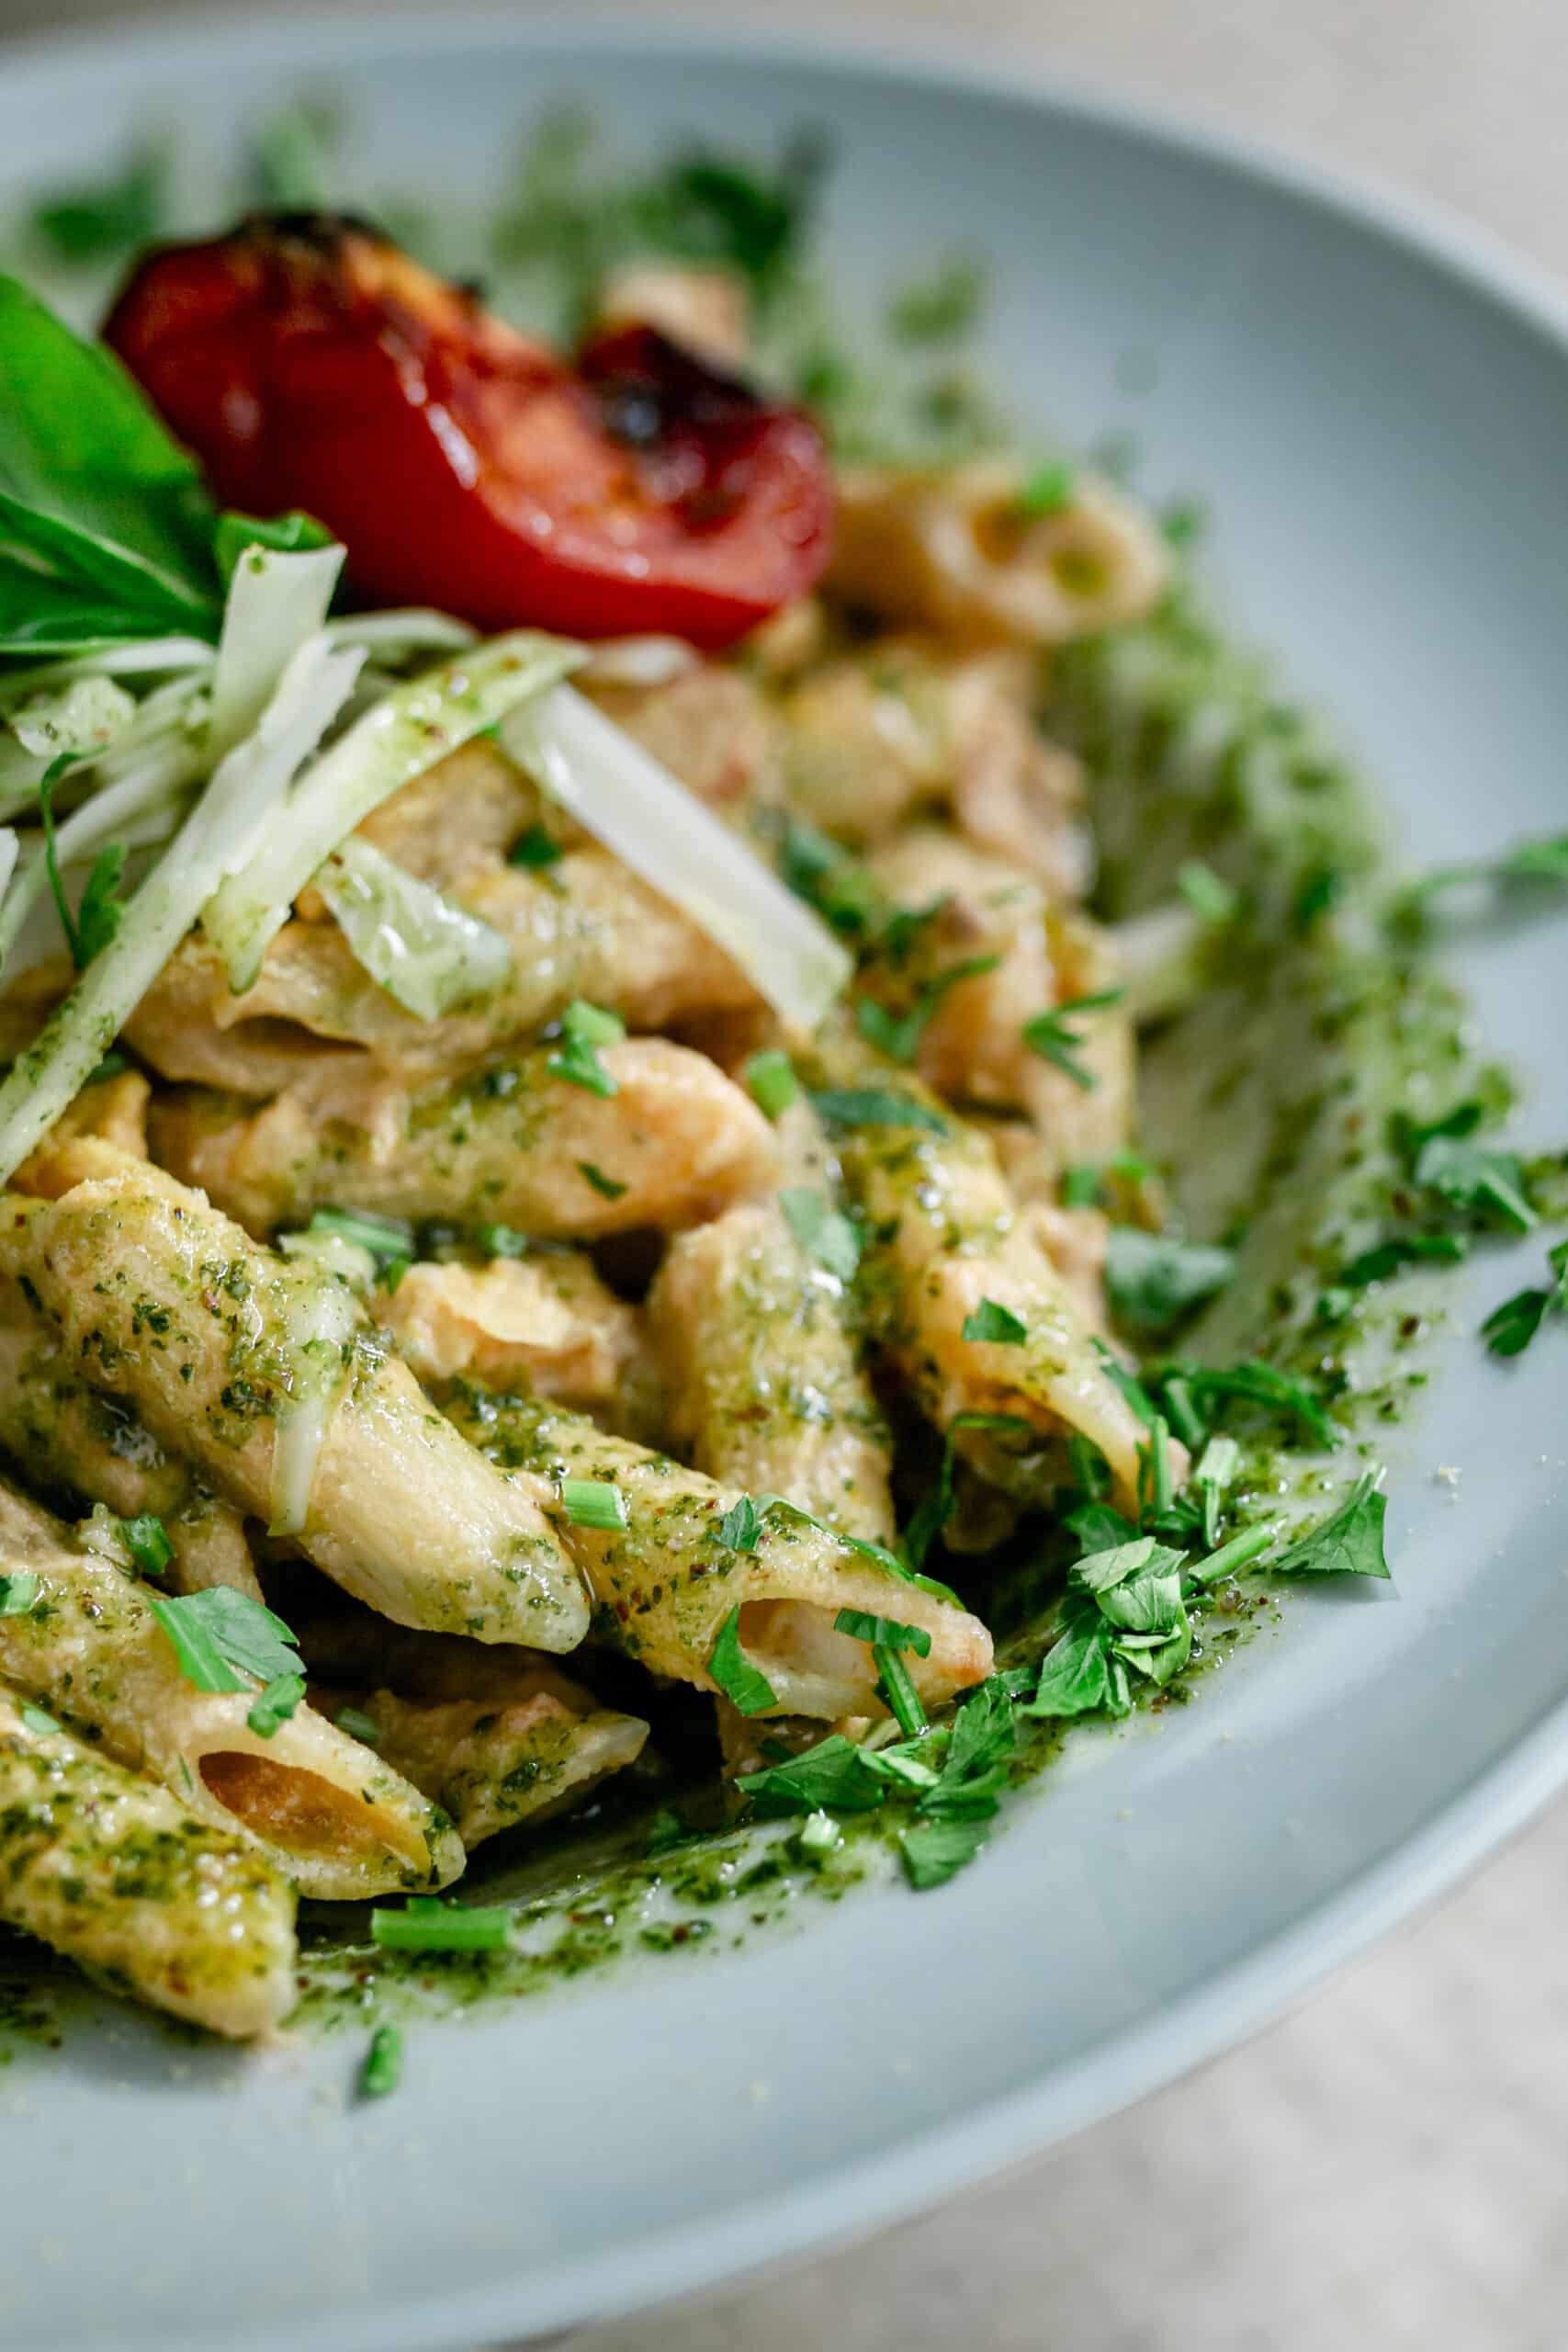 Vegan Food - Organi Chiado